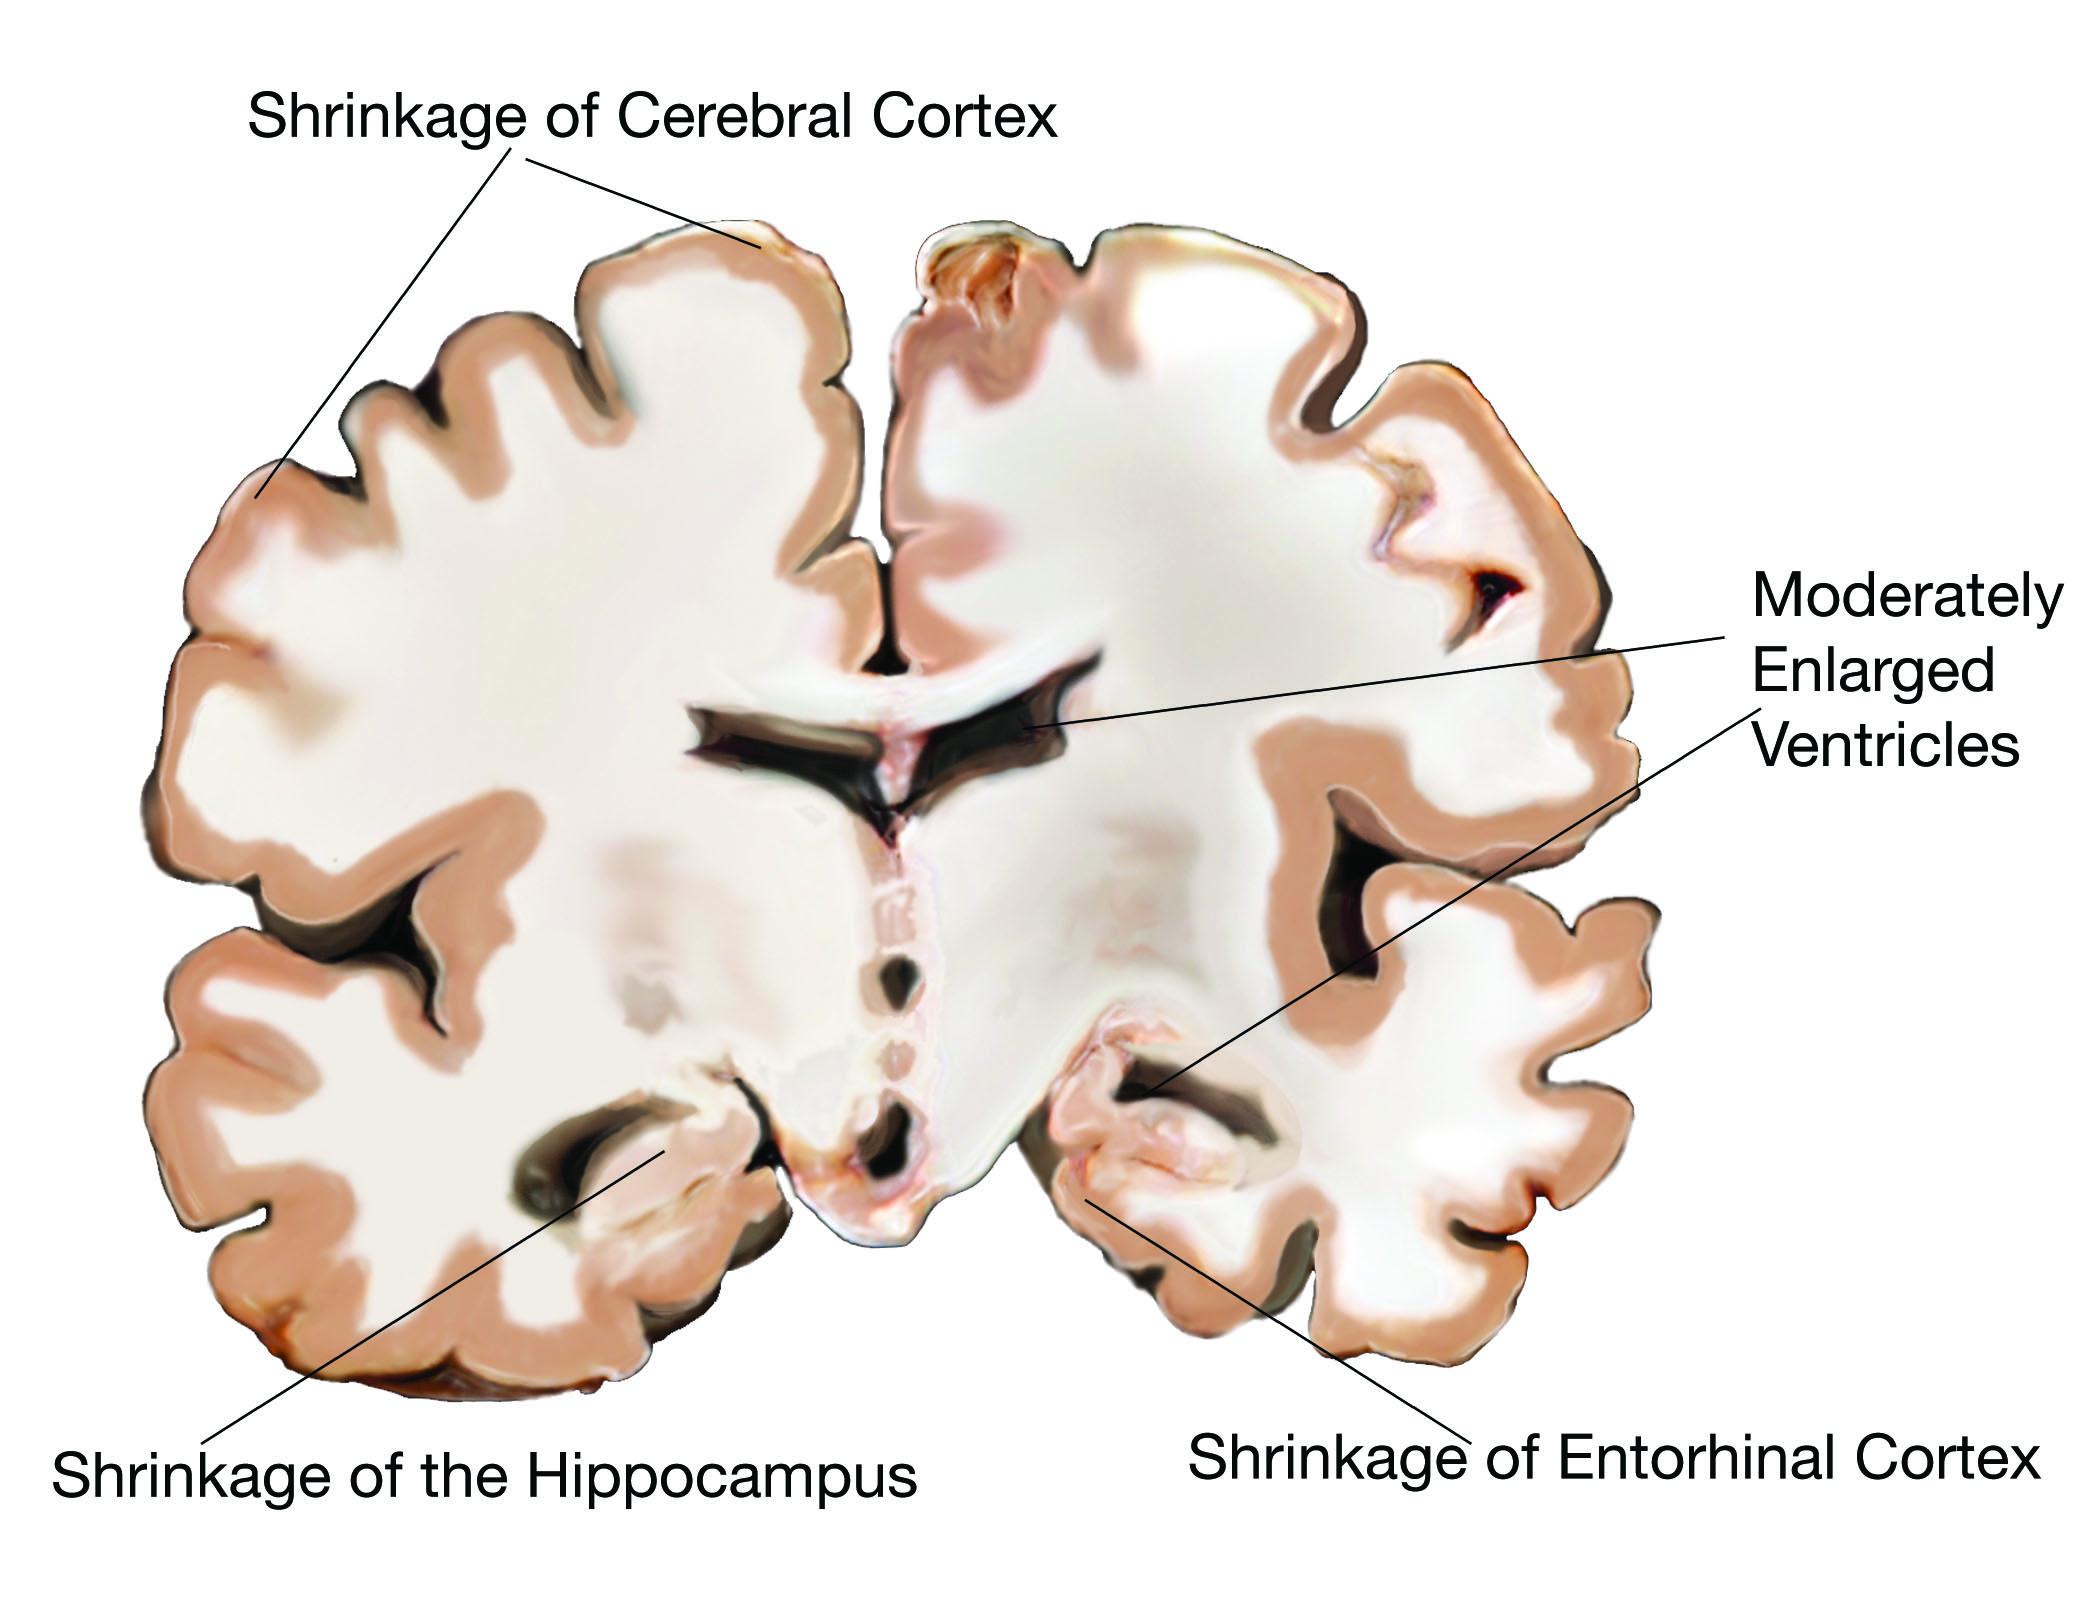 Brains clipart alzheimer's #4